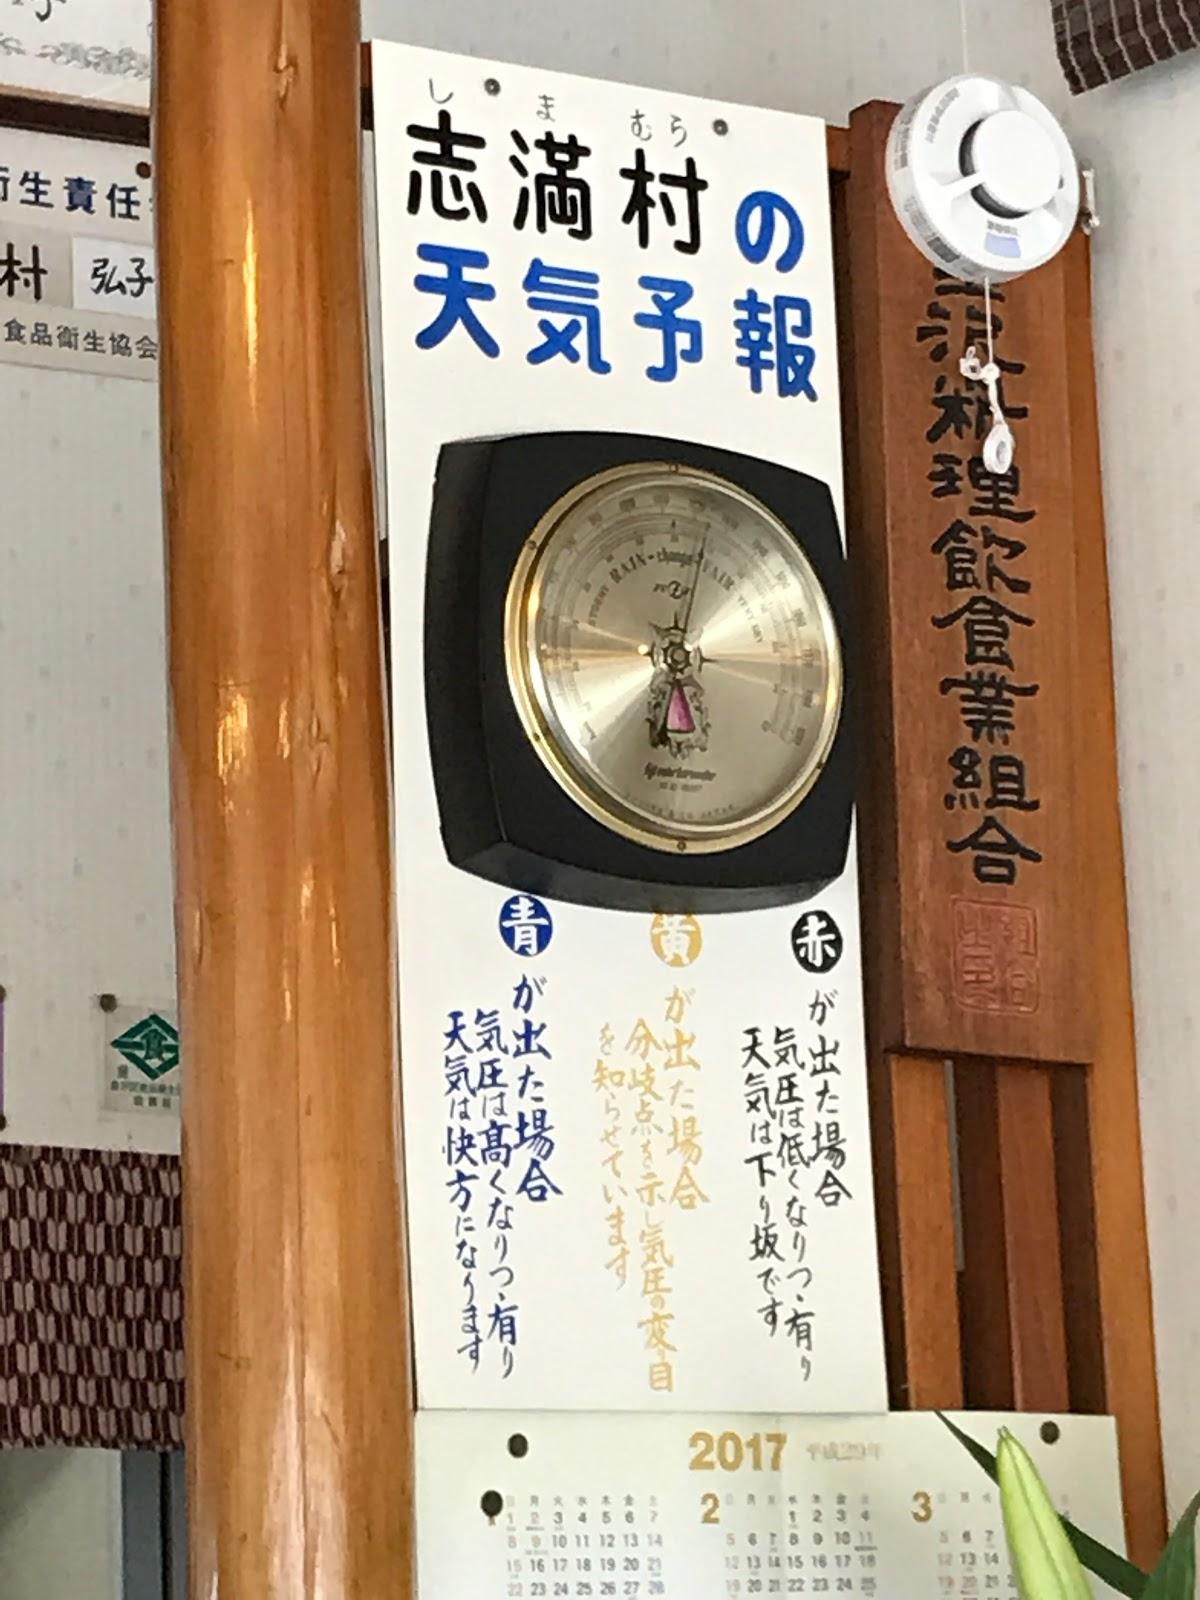 横浜 天気 今日 の 神奈川 東部(横浜)の天気